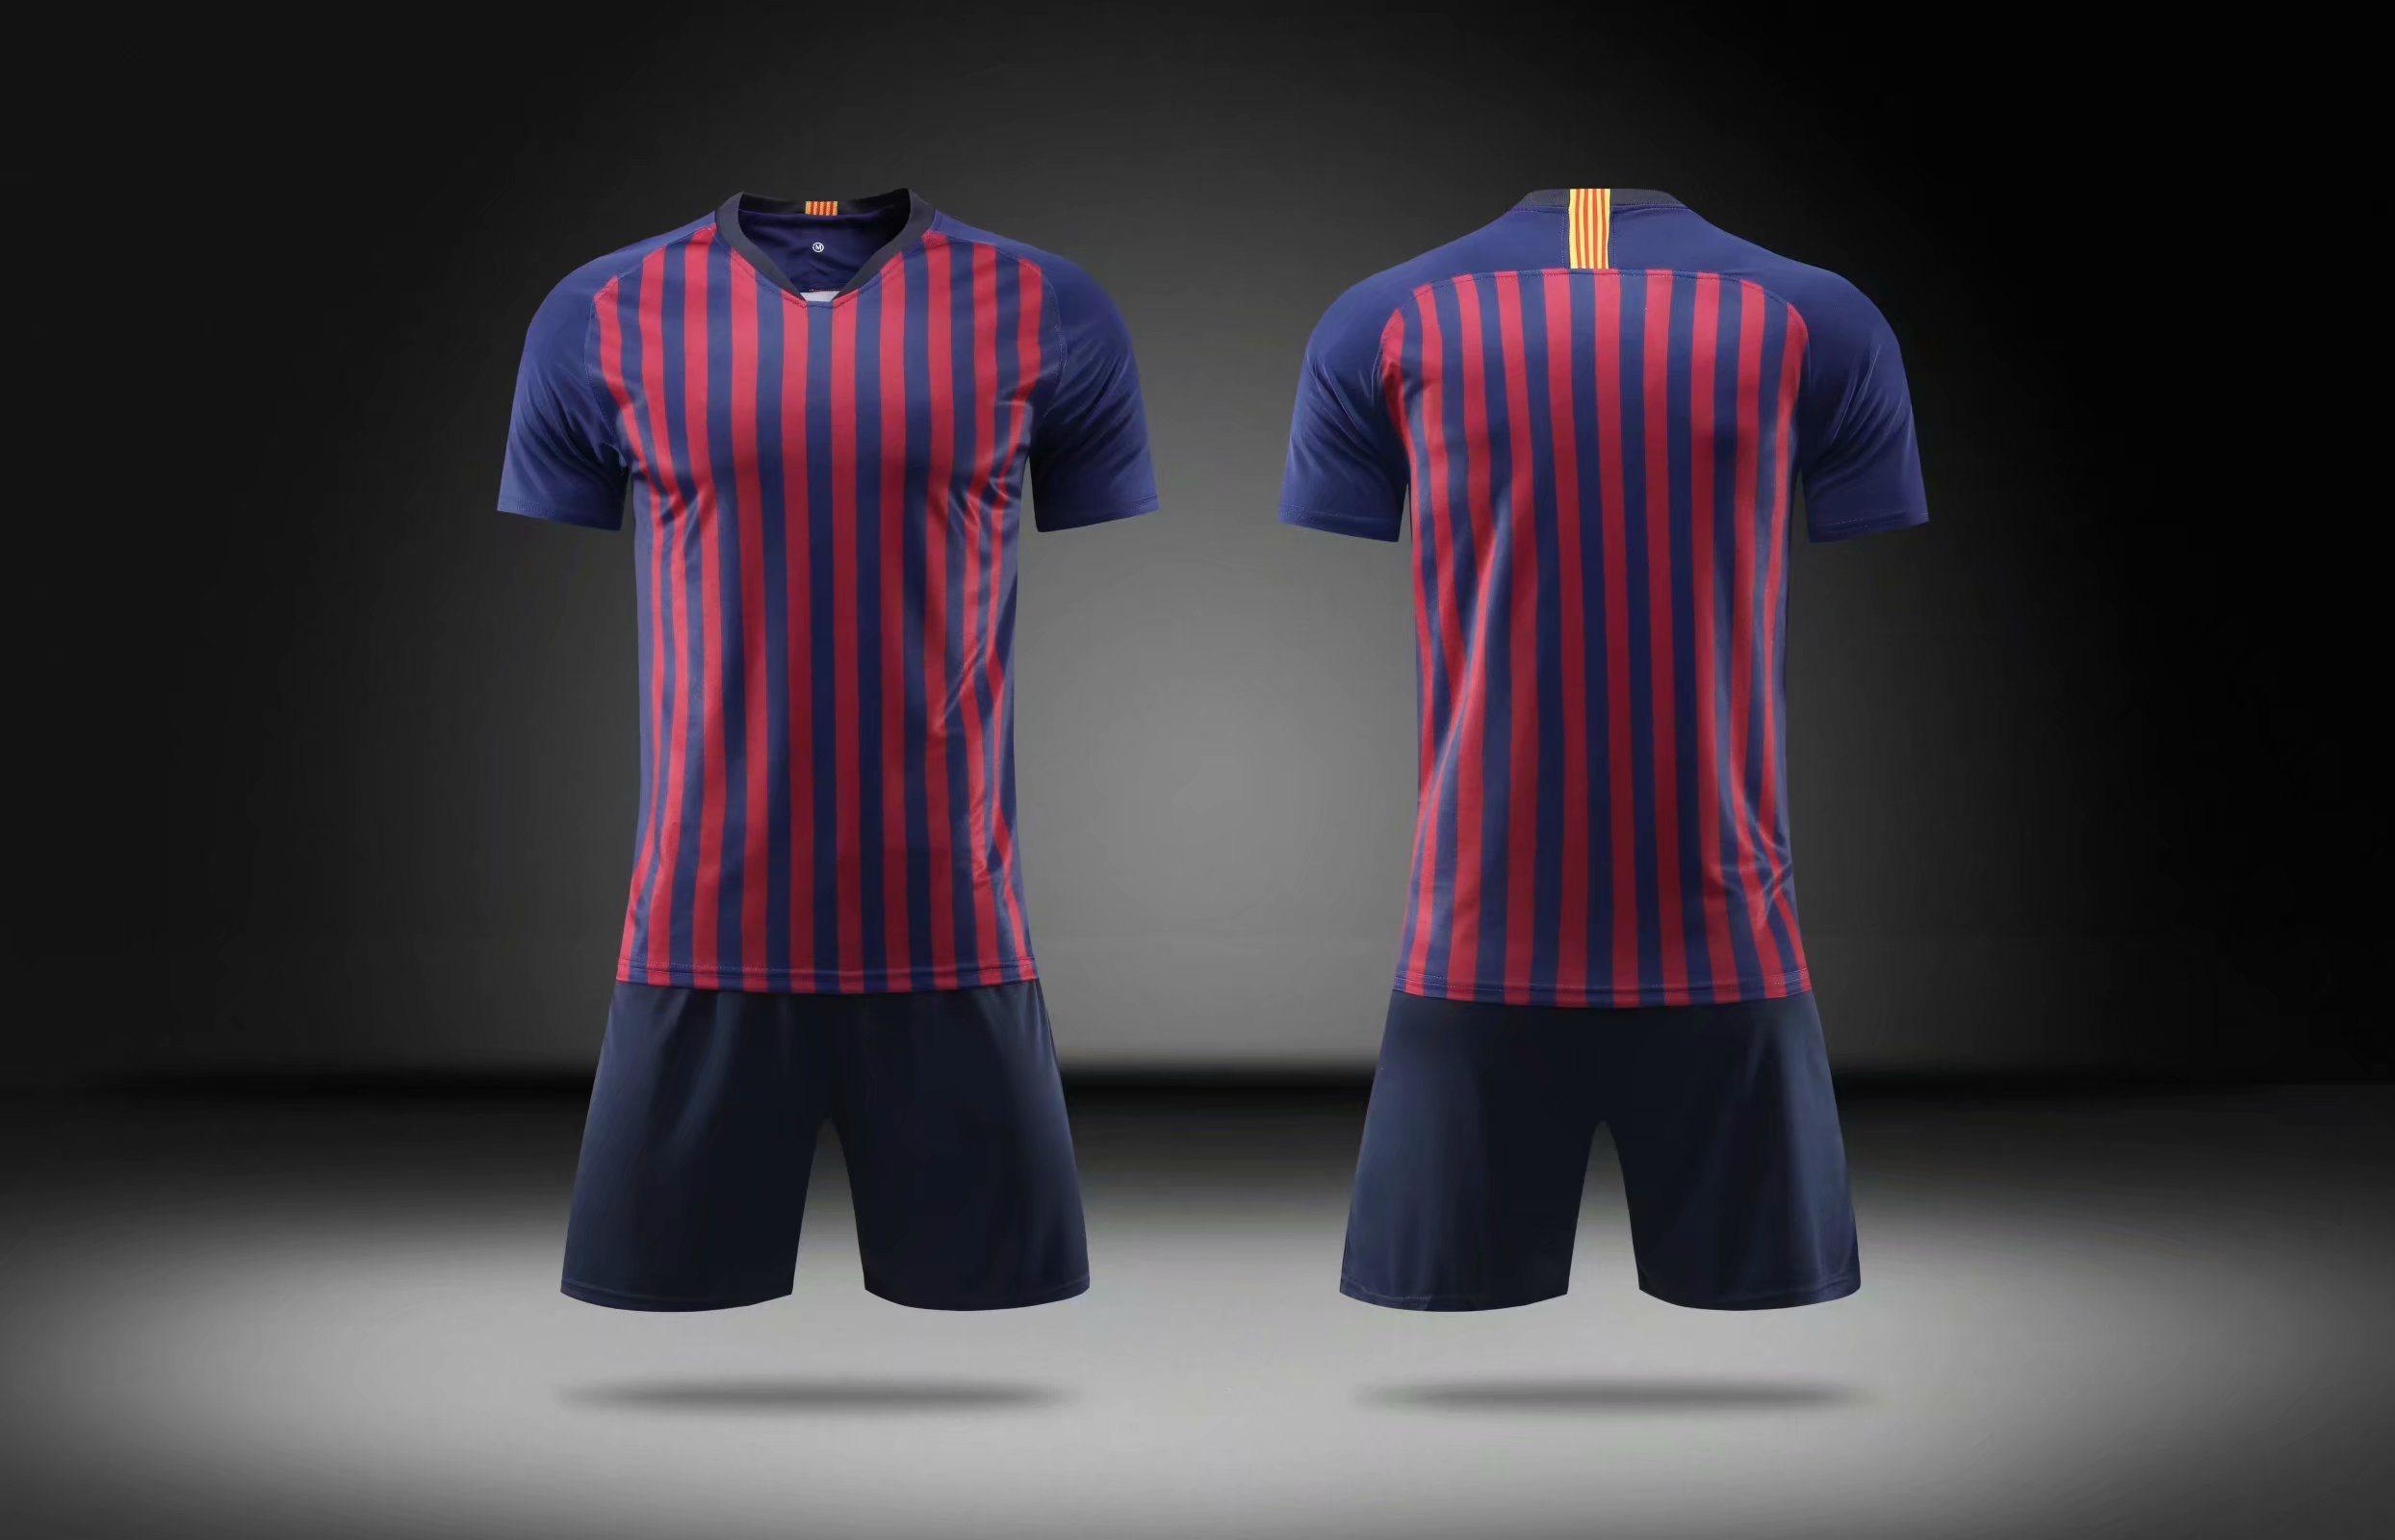 8e49a2c7125 China 2018-2019 Fashion Barc Blue Red Soccer Kits (woman football Jersey  tshirts) - China Real Madrid Home Soccer Jersey, Long Sleeve White T-Shirt